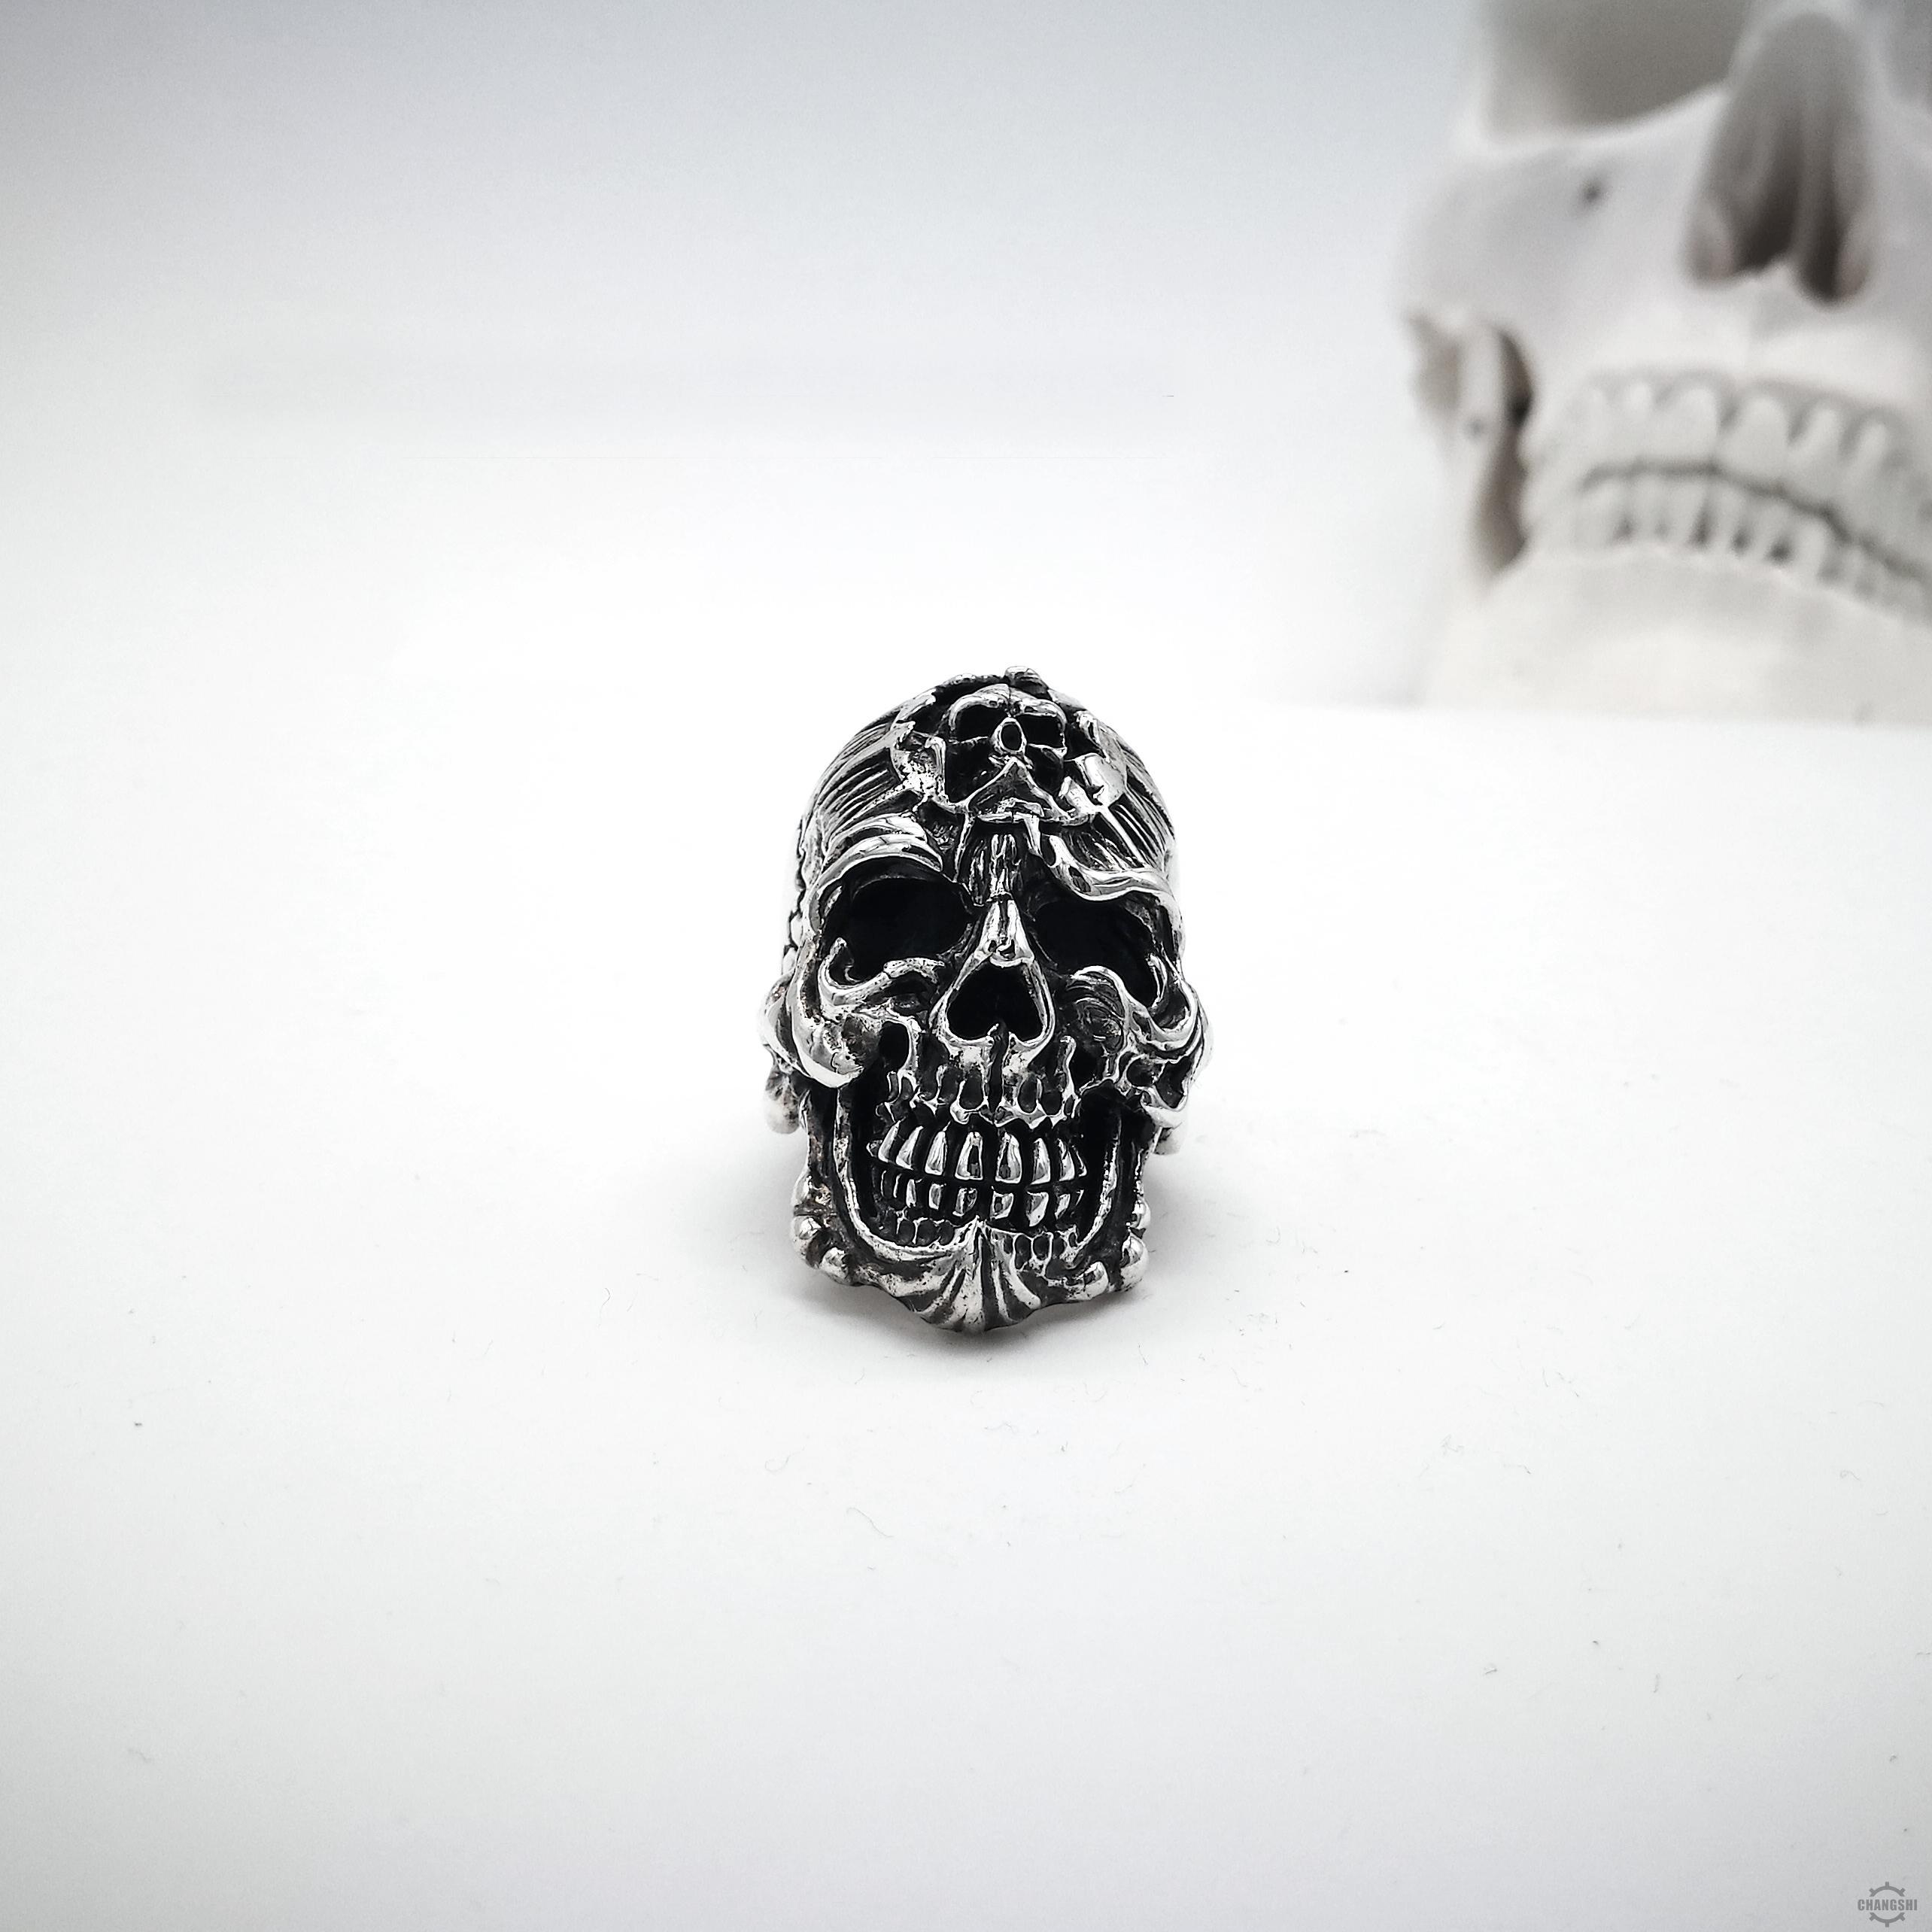 Jor205 original ghost ring zr25